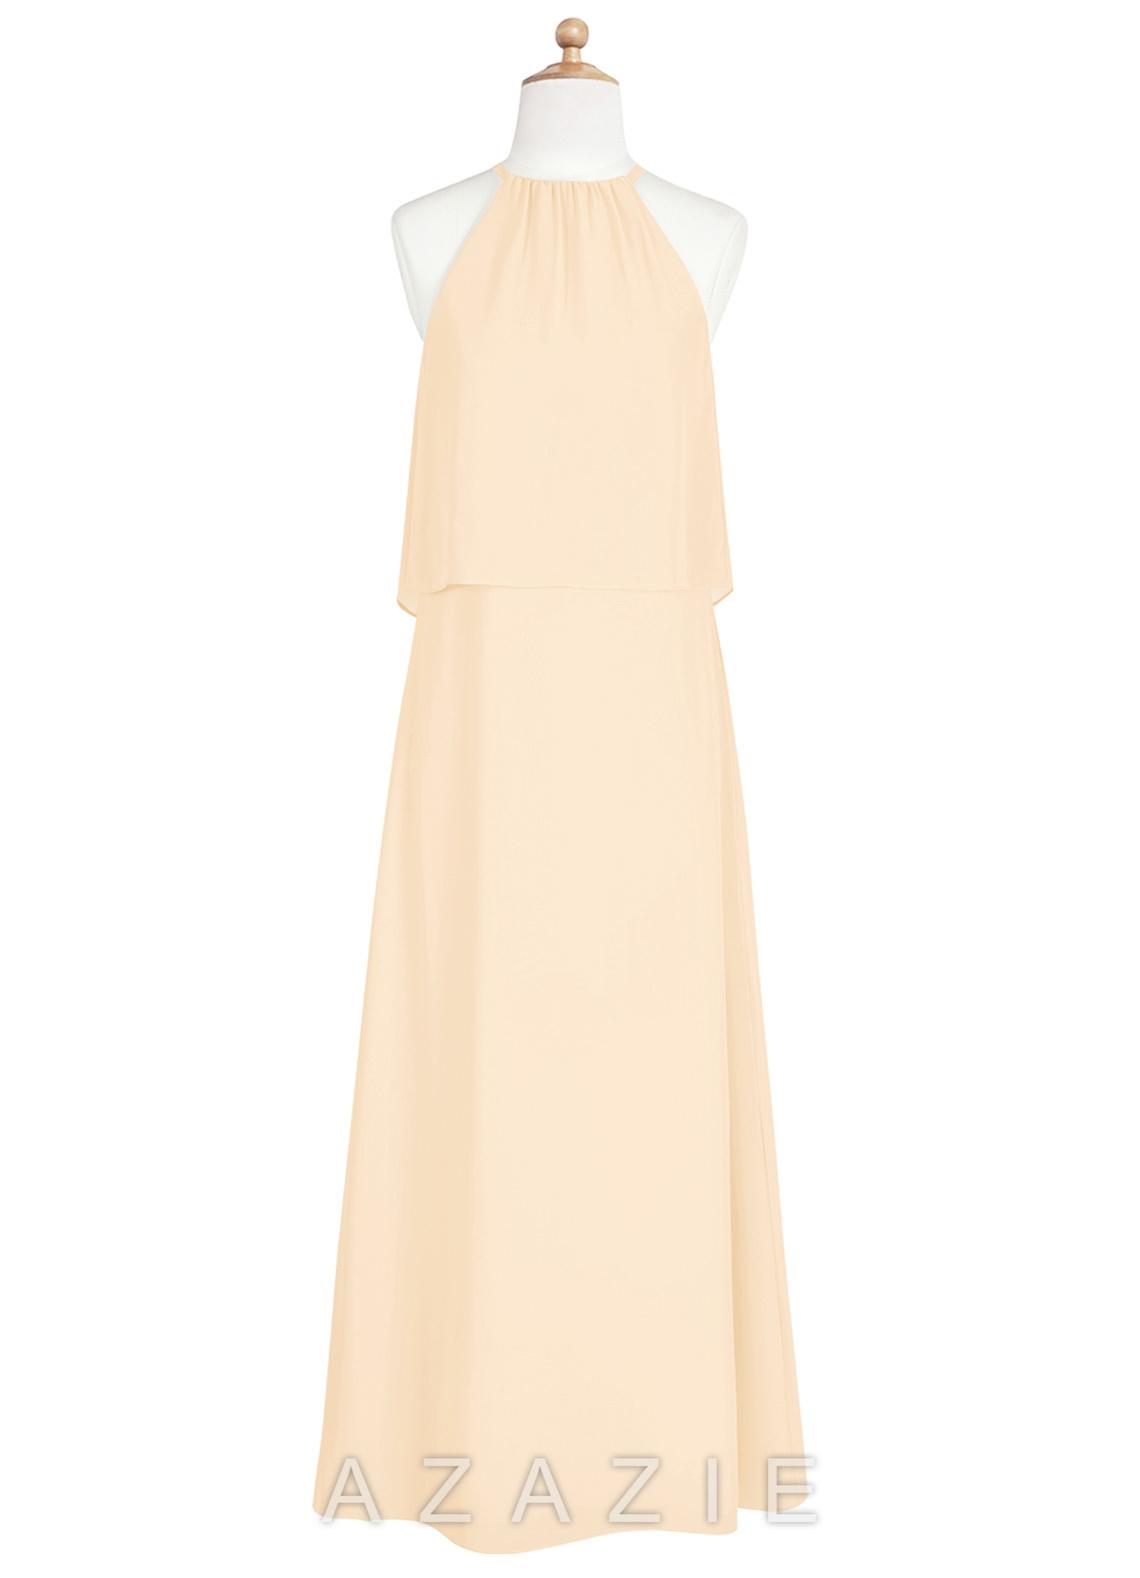 6f1169068d4 Wisteria Bridesmaids Dresses Wisteria lavender and khaki